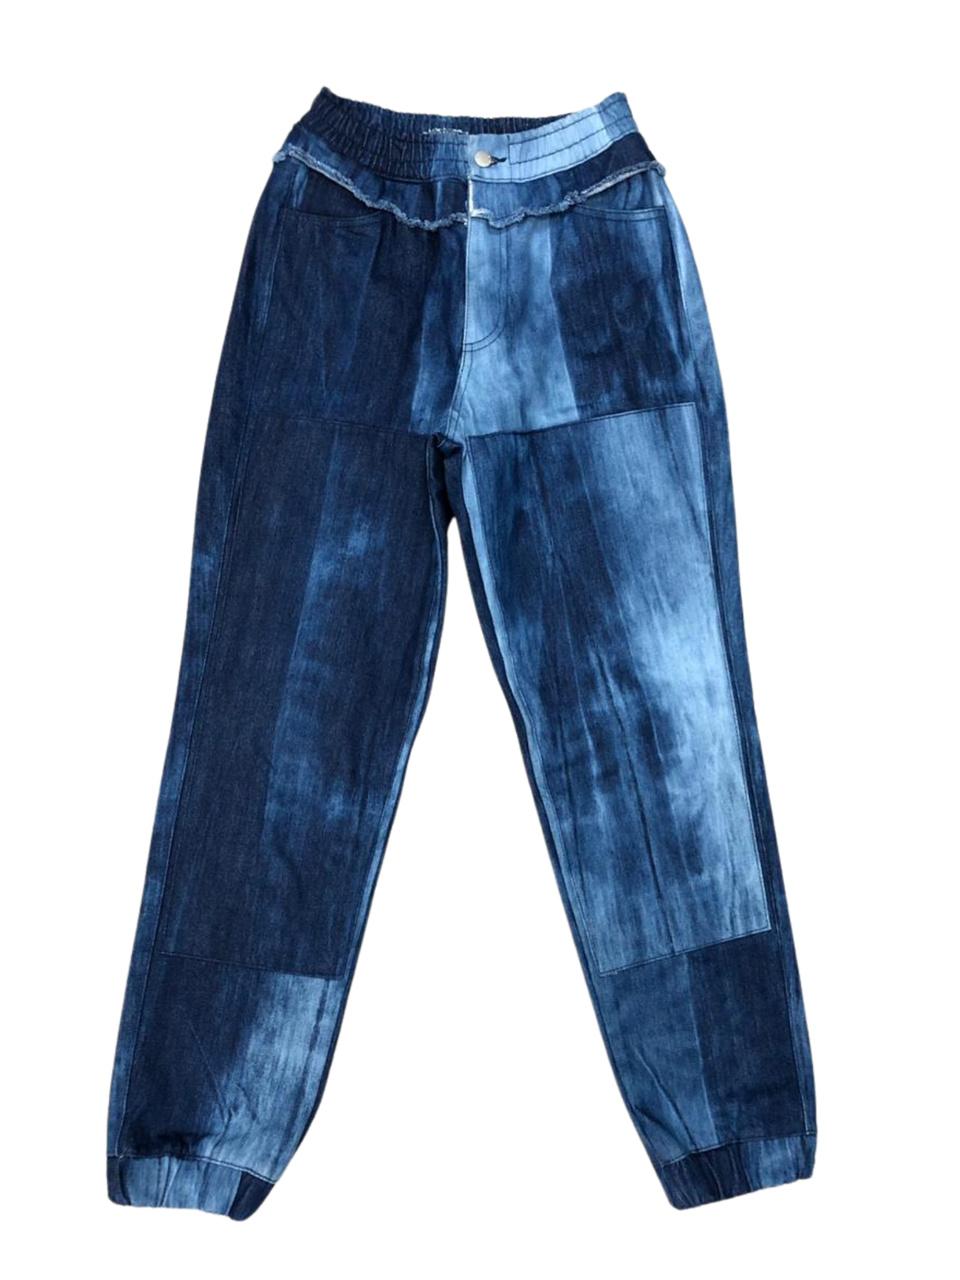 Calça jeans - art denim